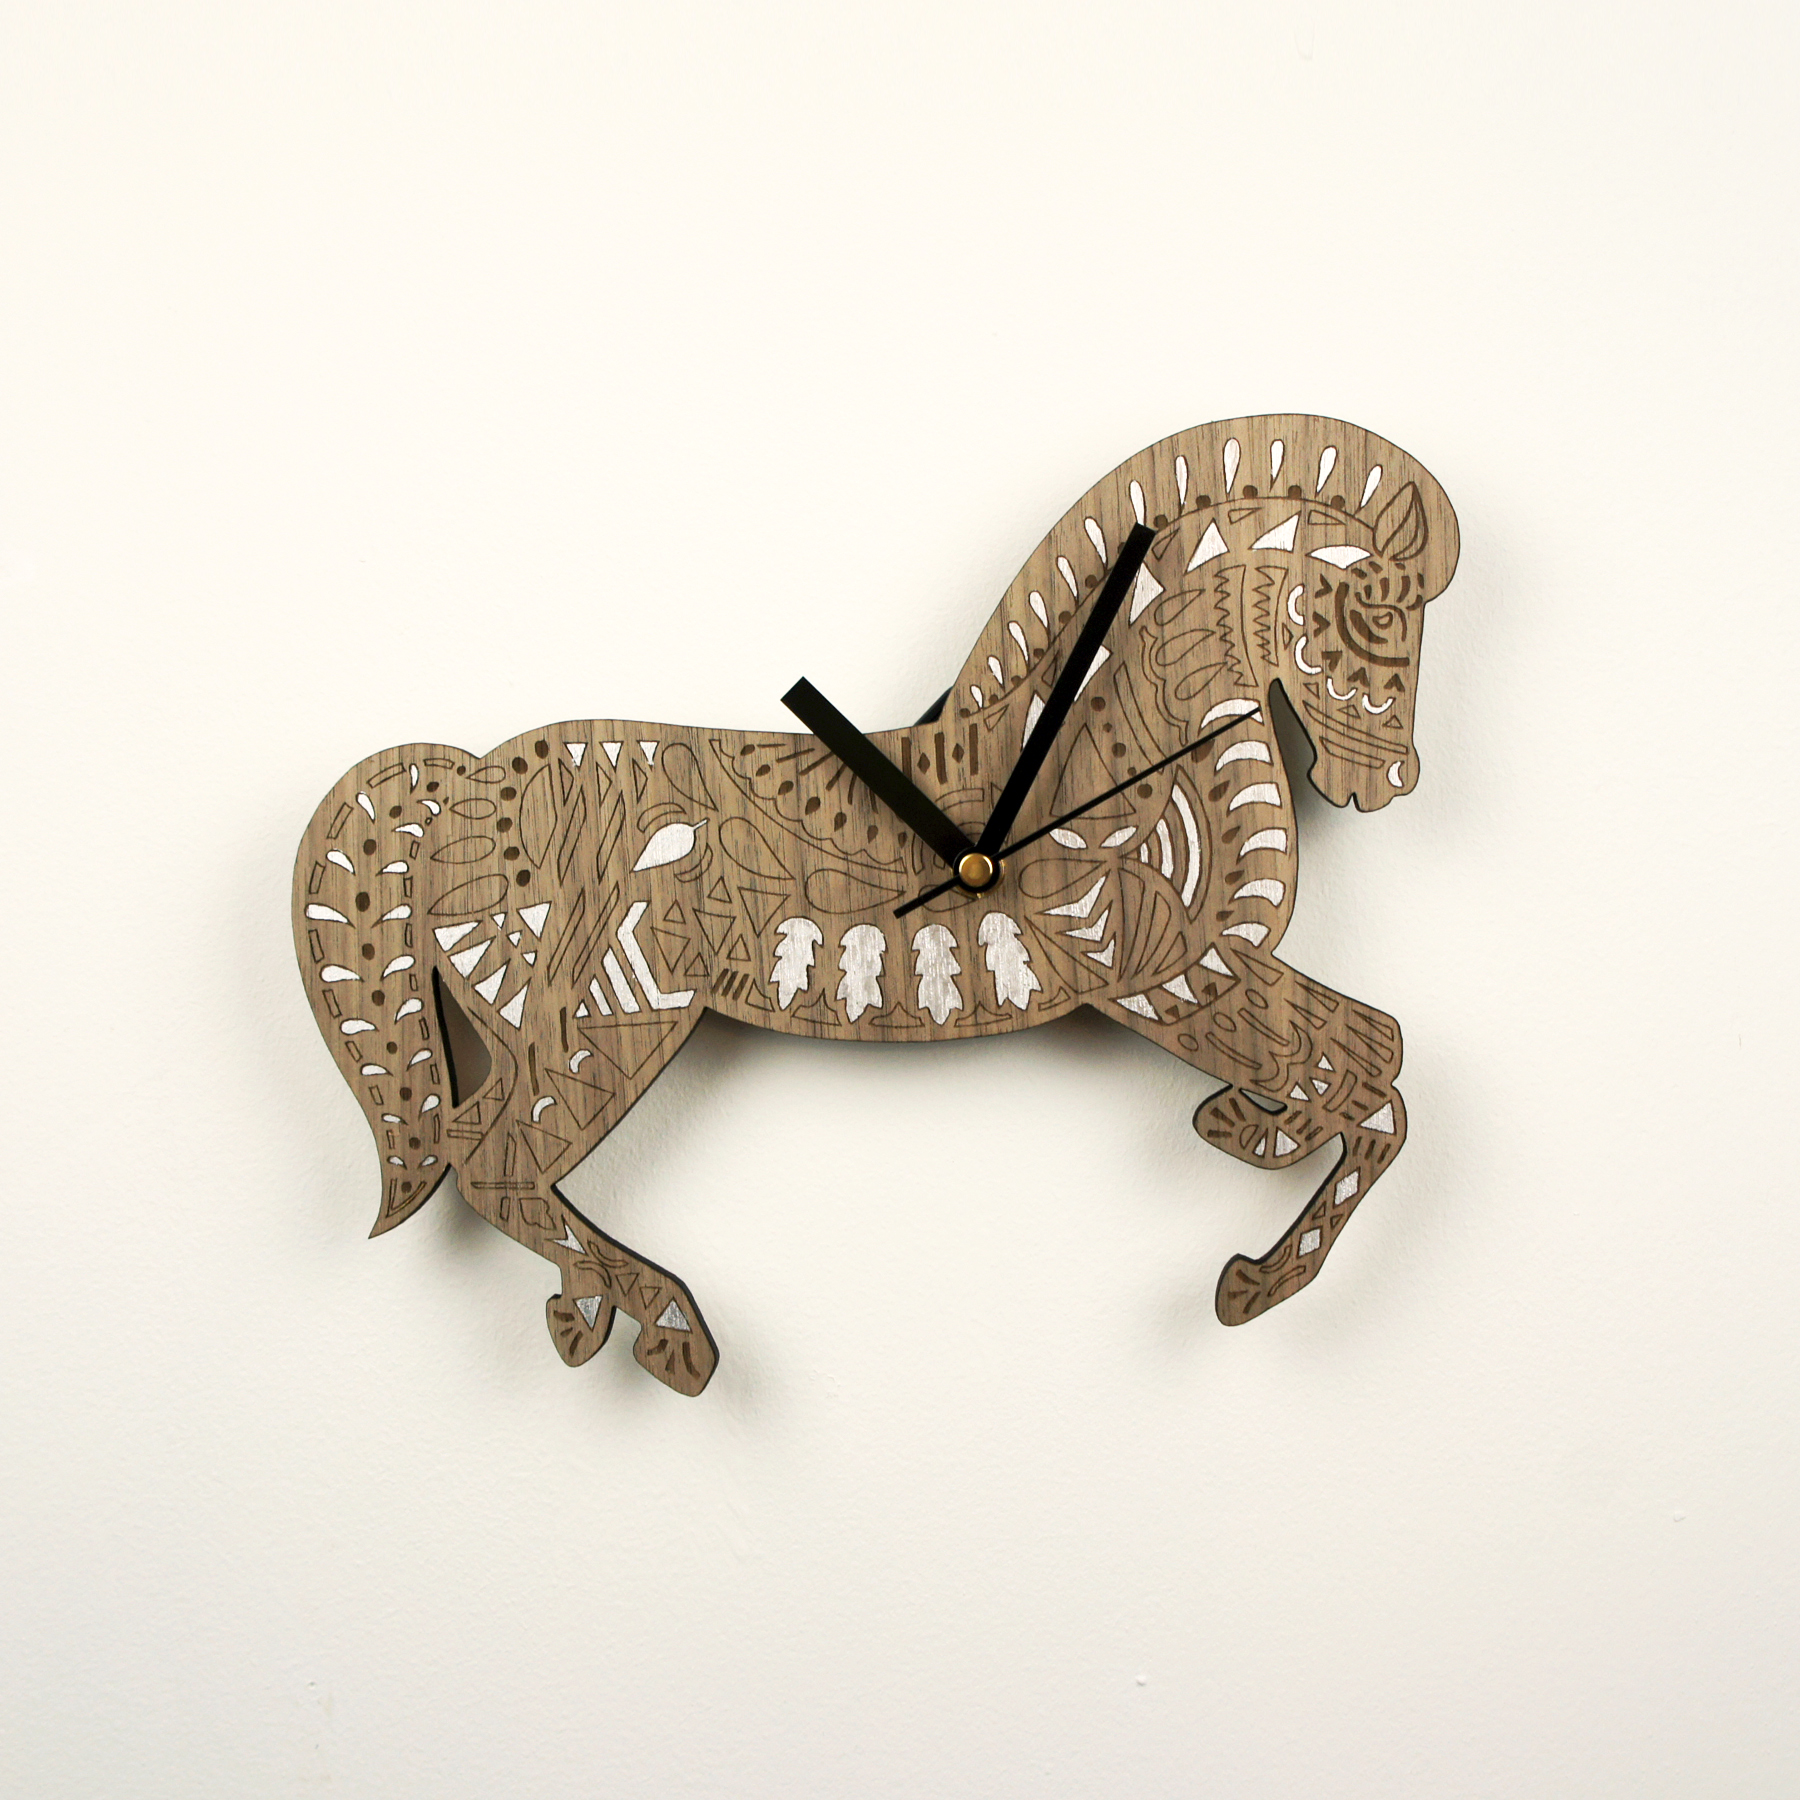 Horse clock by Kirsty Baynham